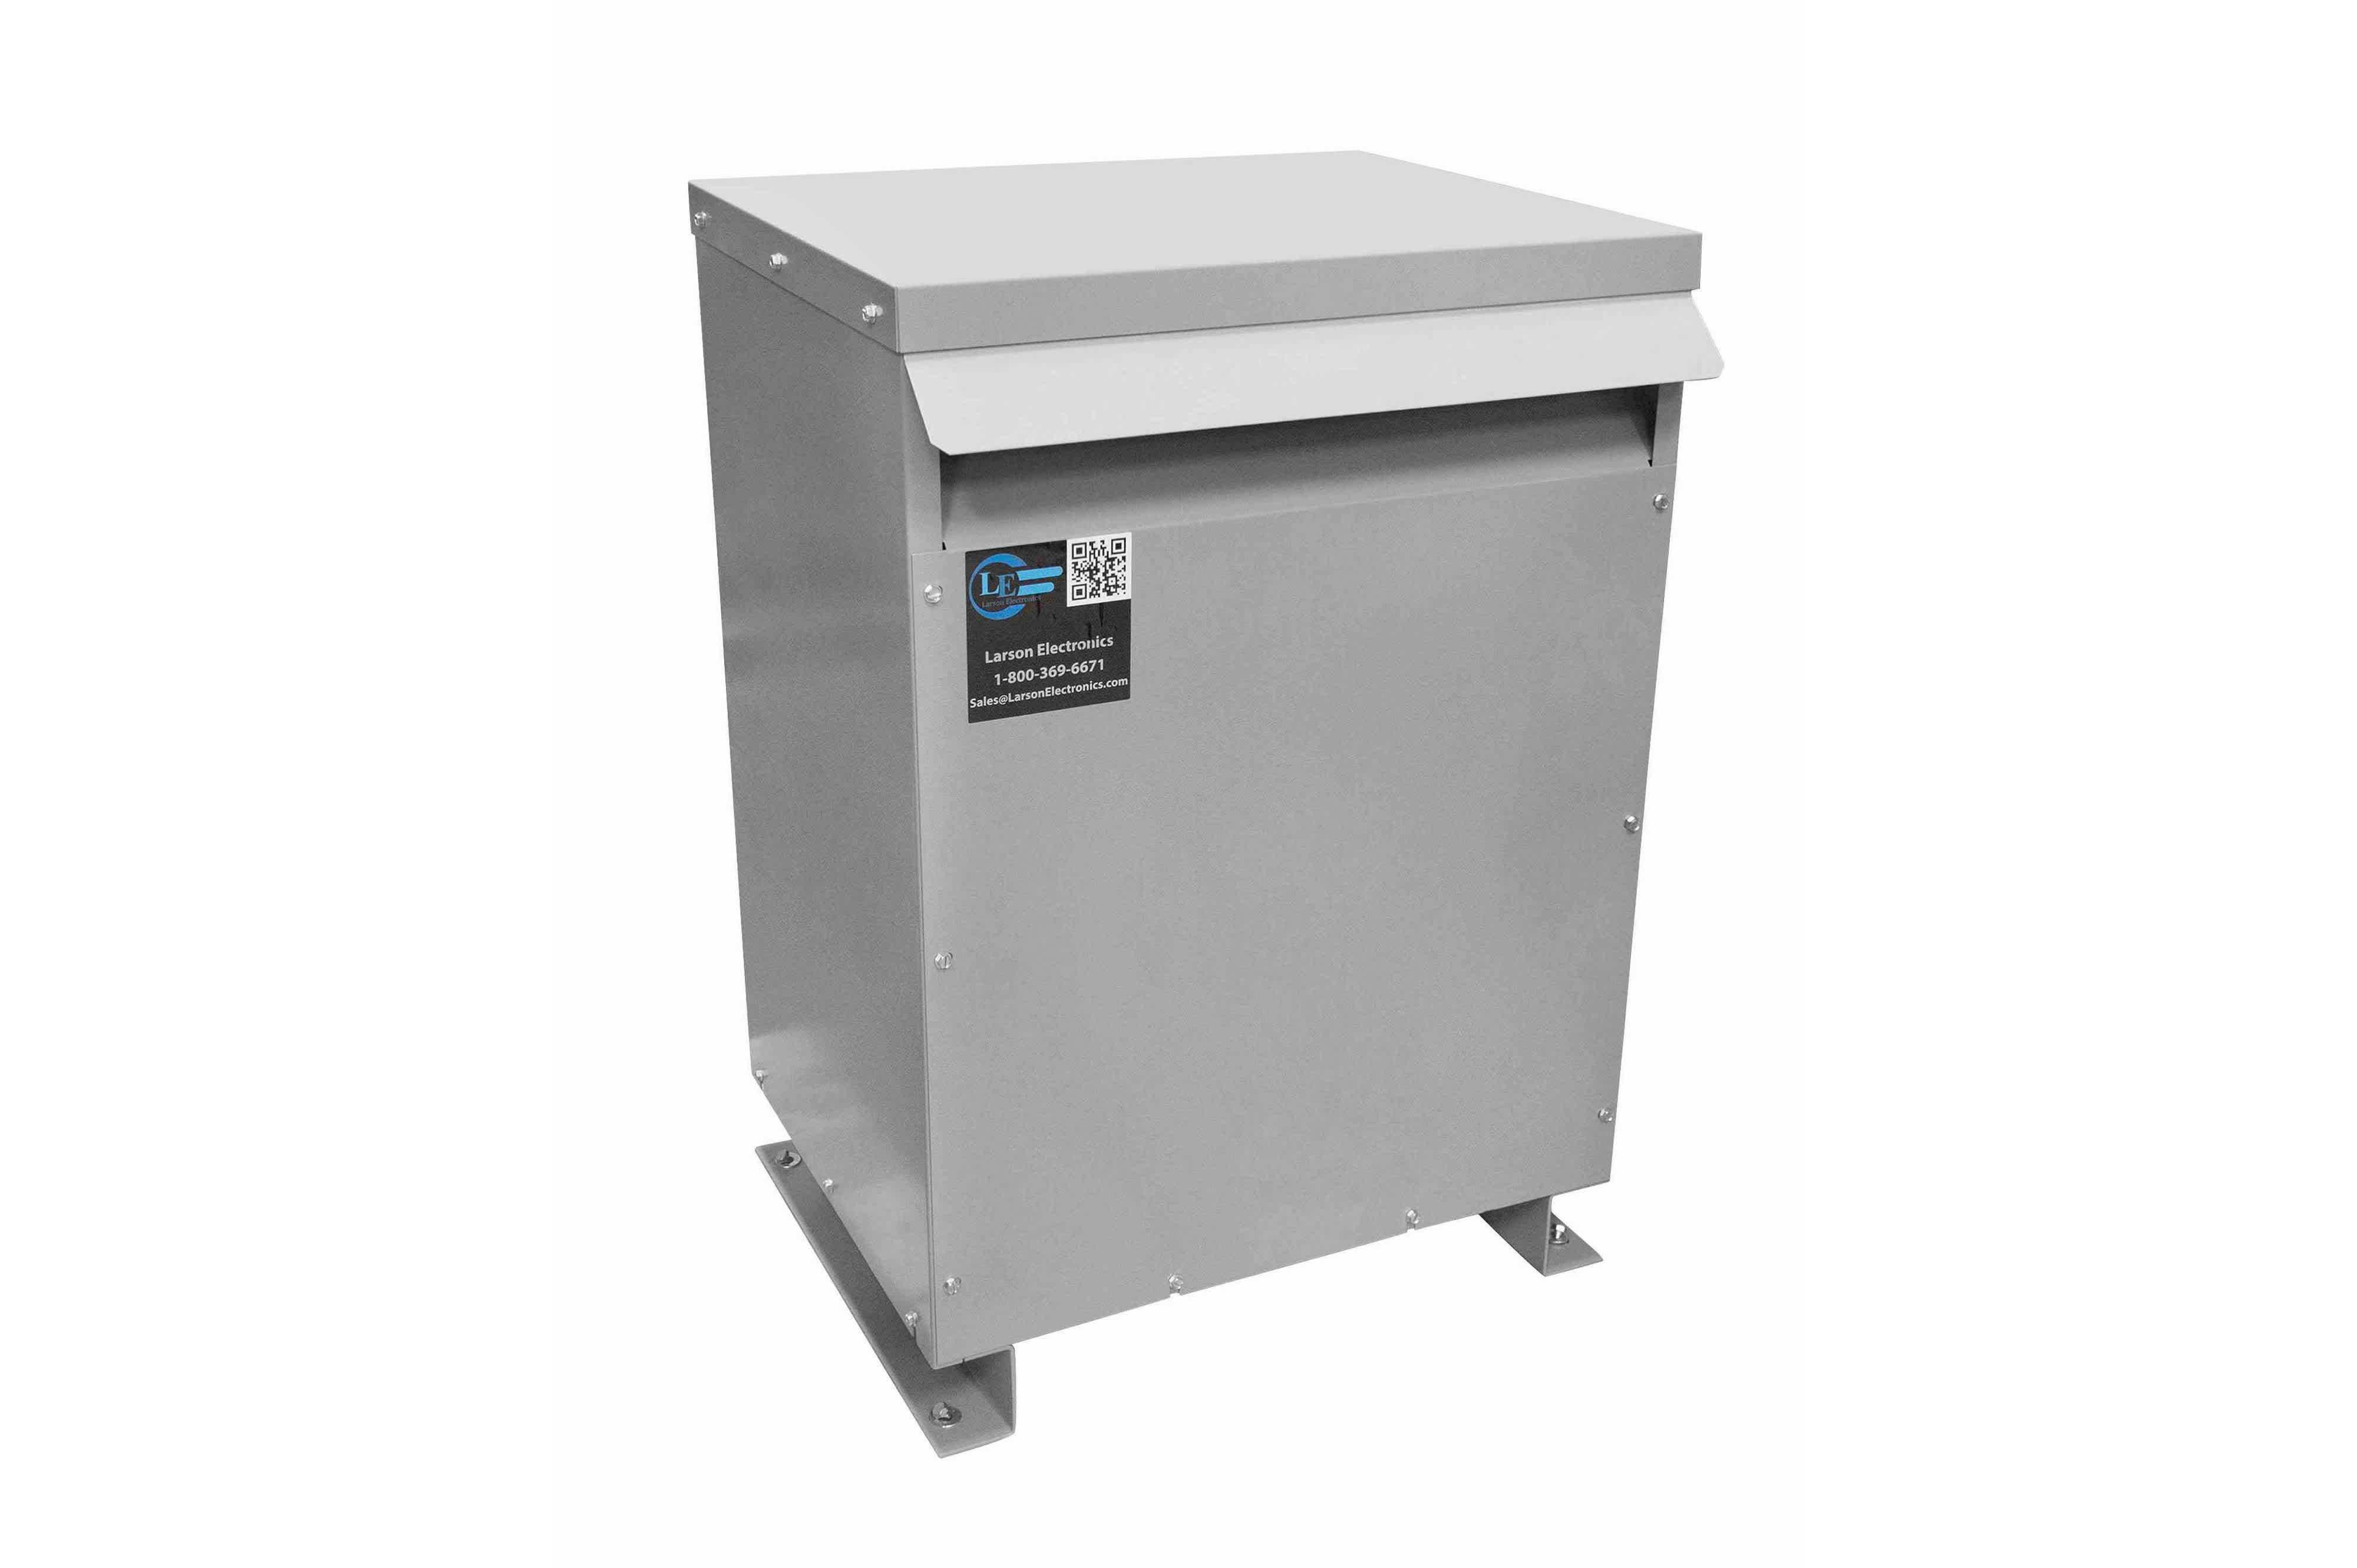 30 kVA 3PH Isolation Transformer, 575V Wye Primary, 240V Delta Secondary, N3R, Ventilated, 60 Hz